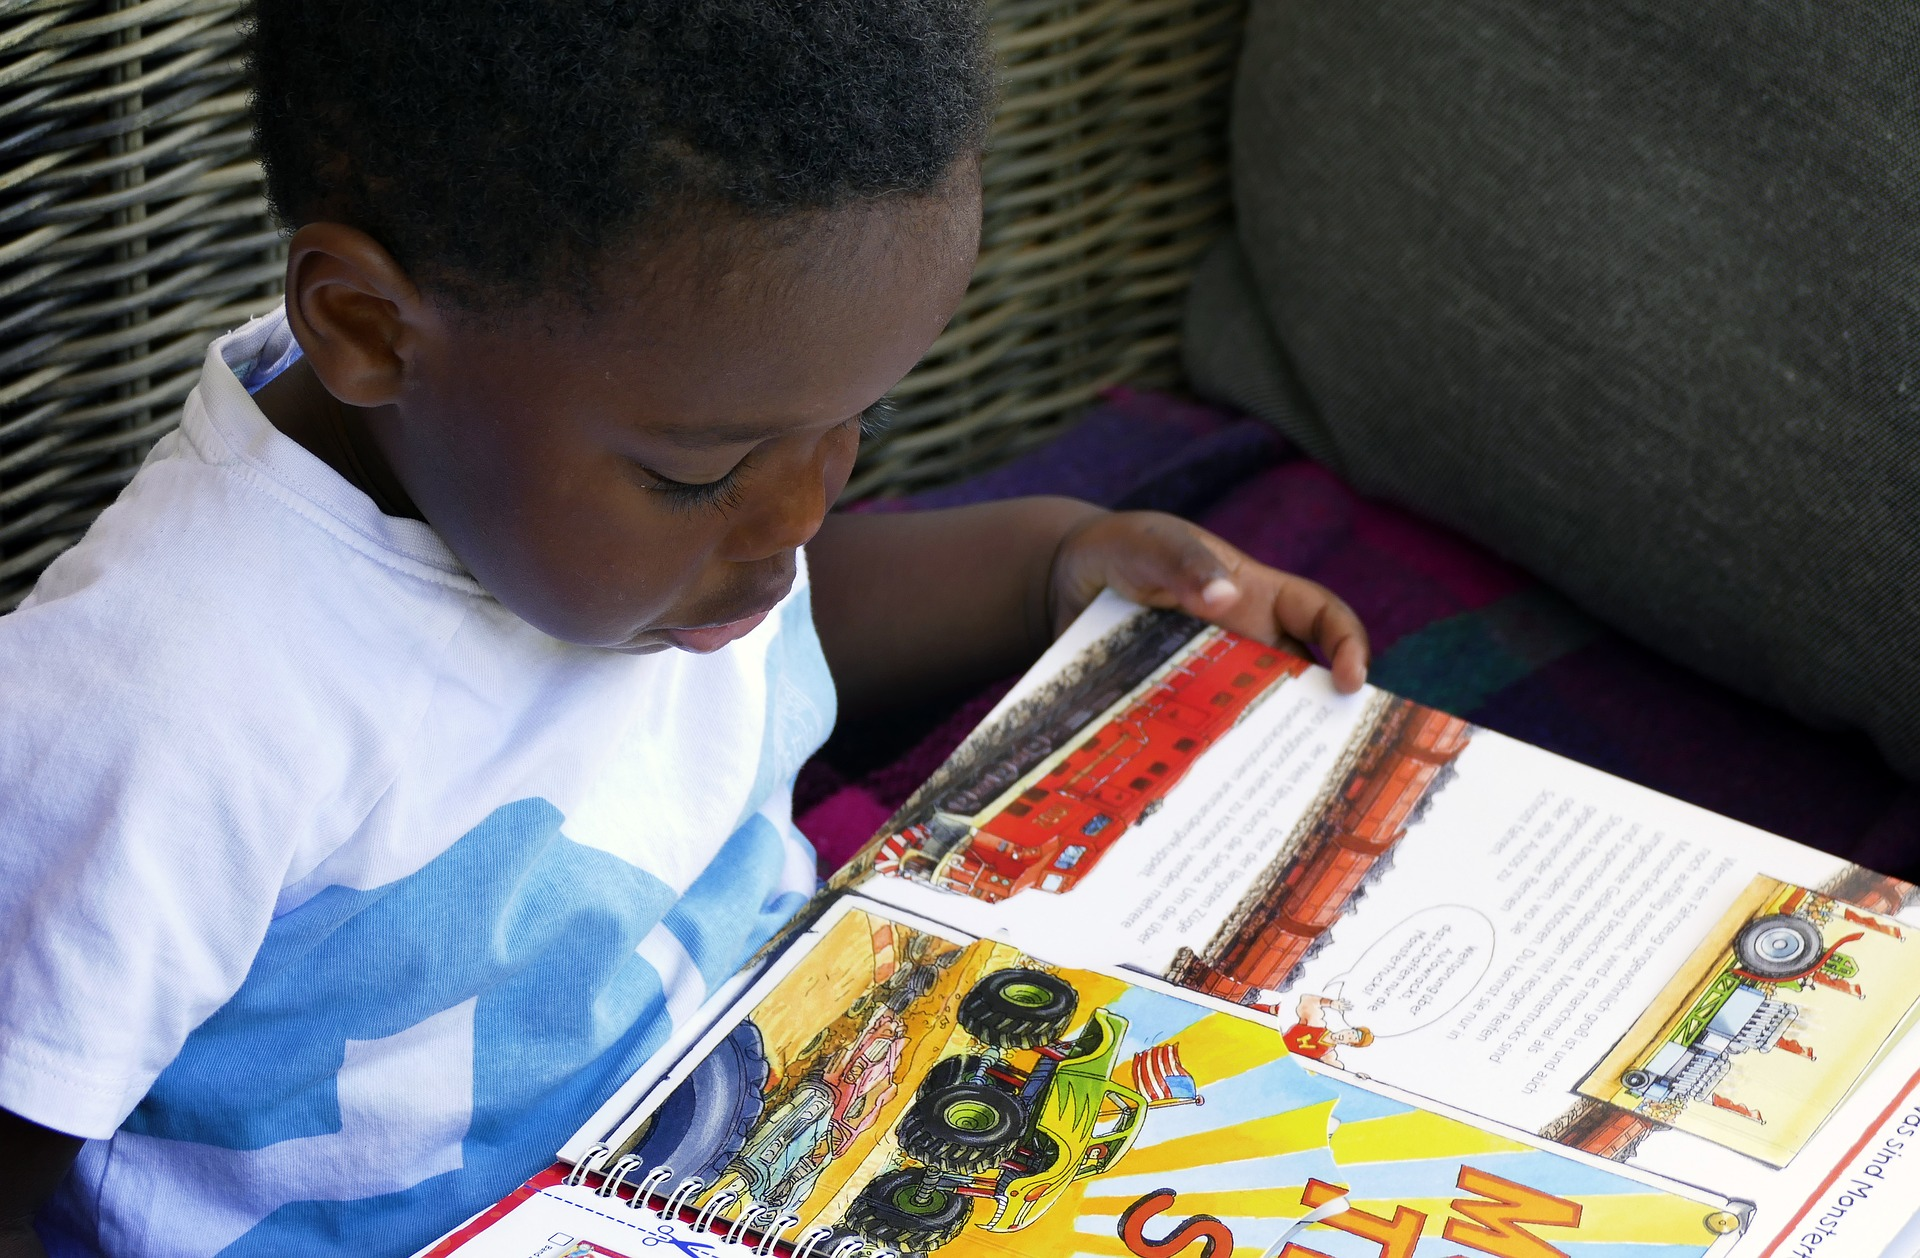 small boy reading